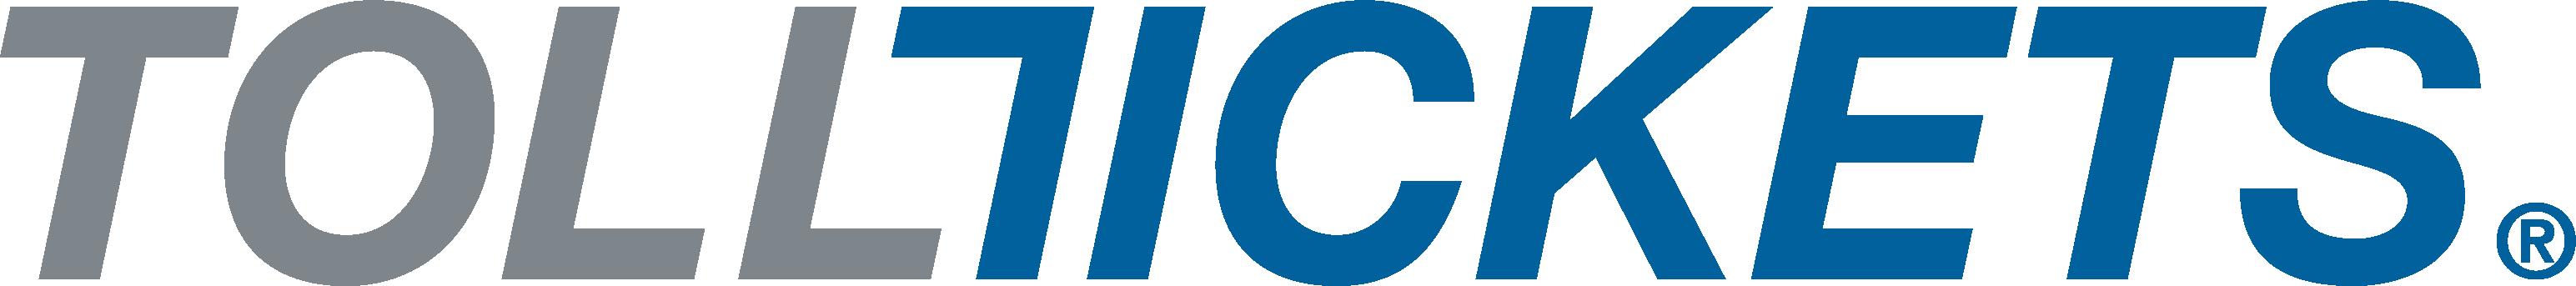 tolltickets GmbH